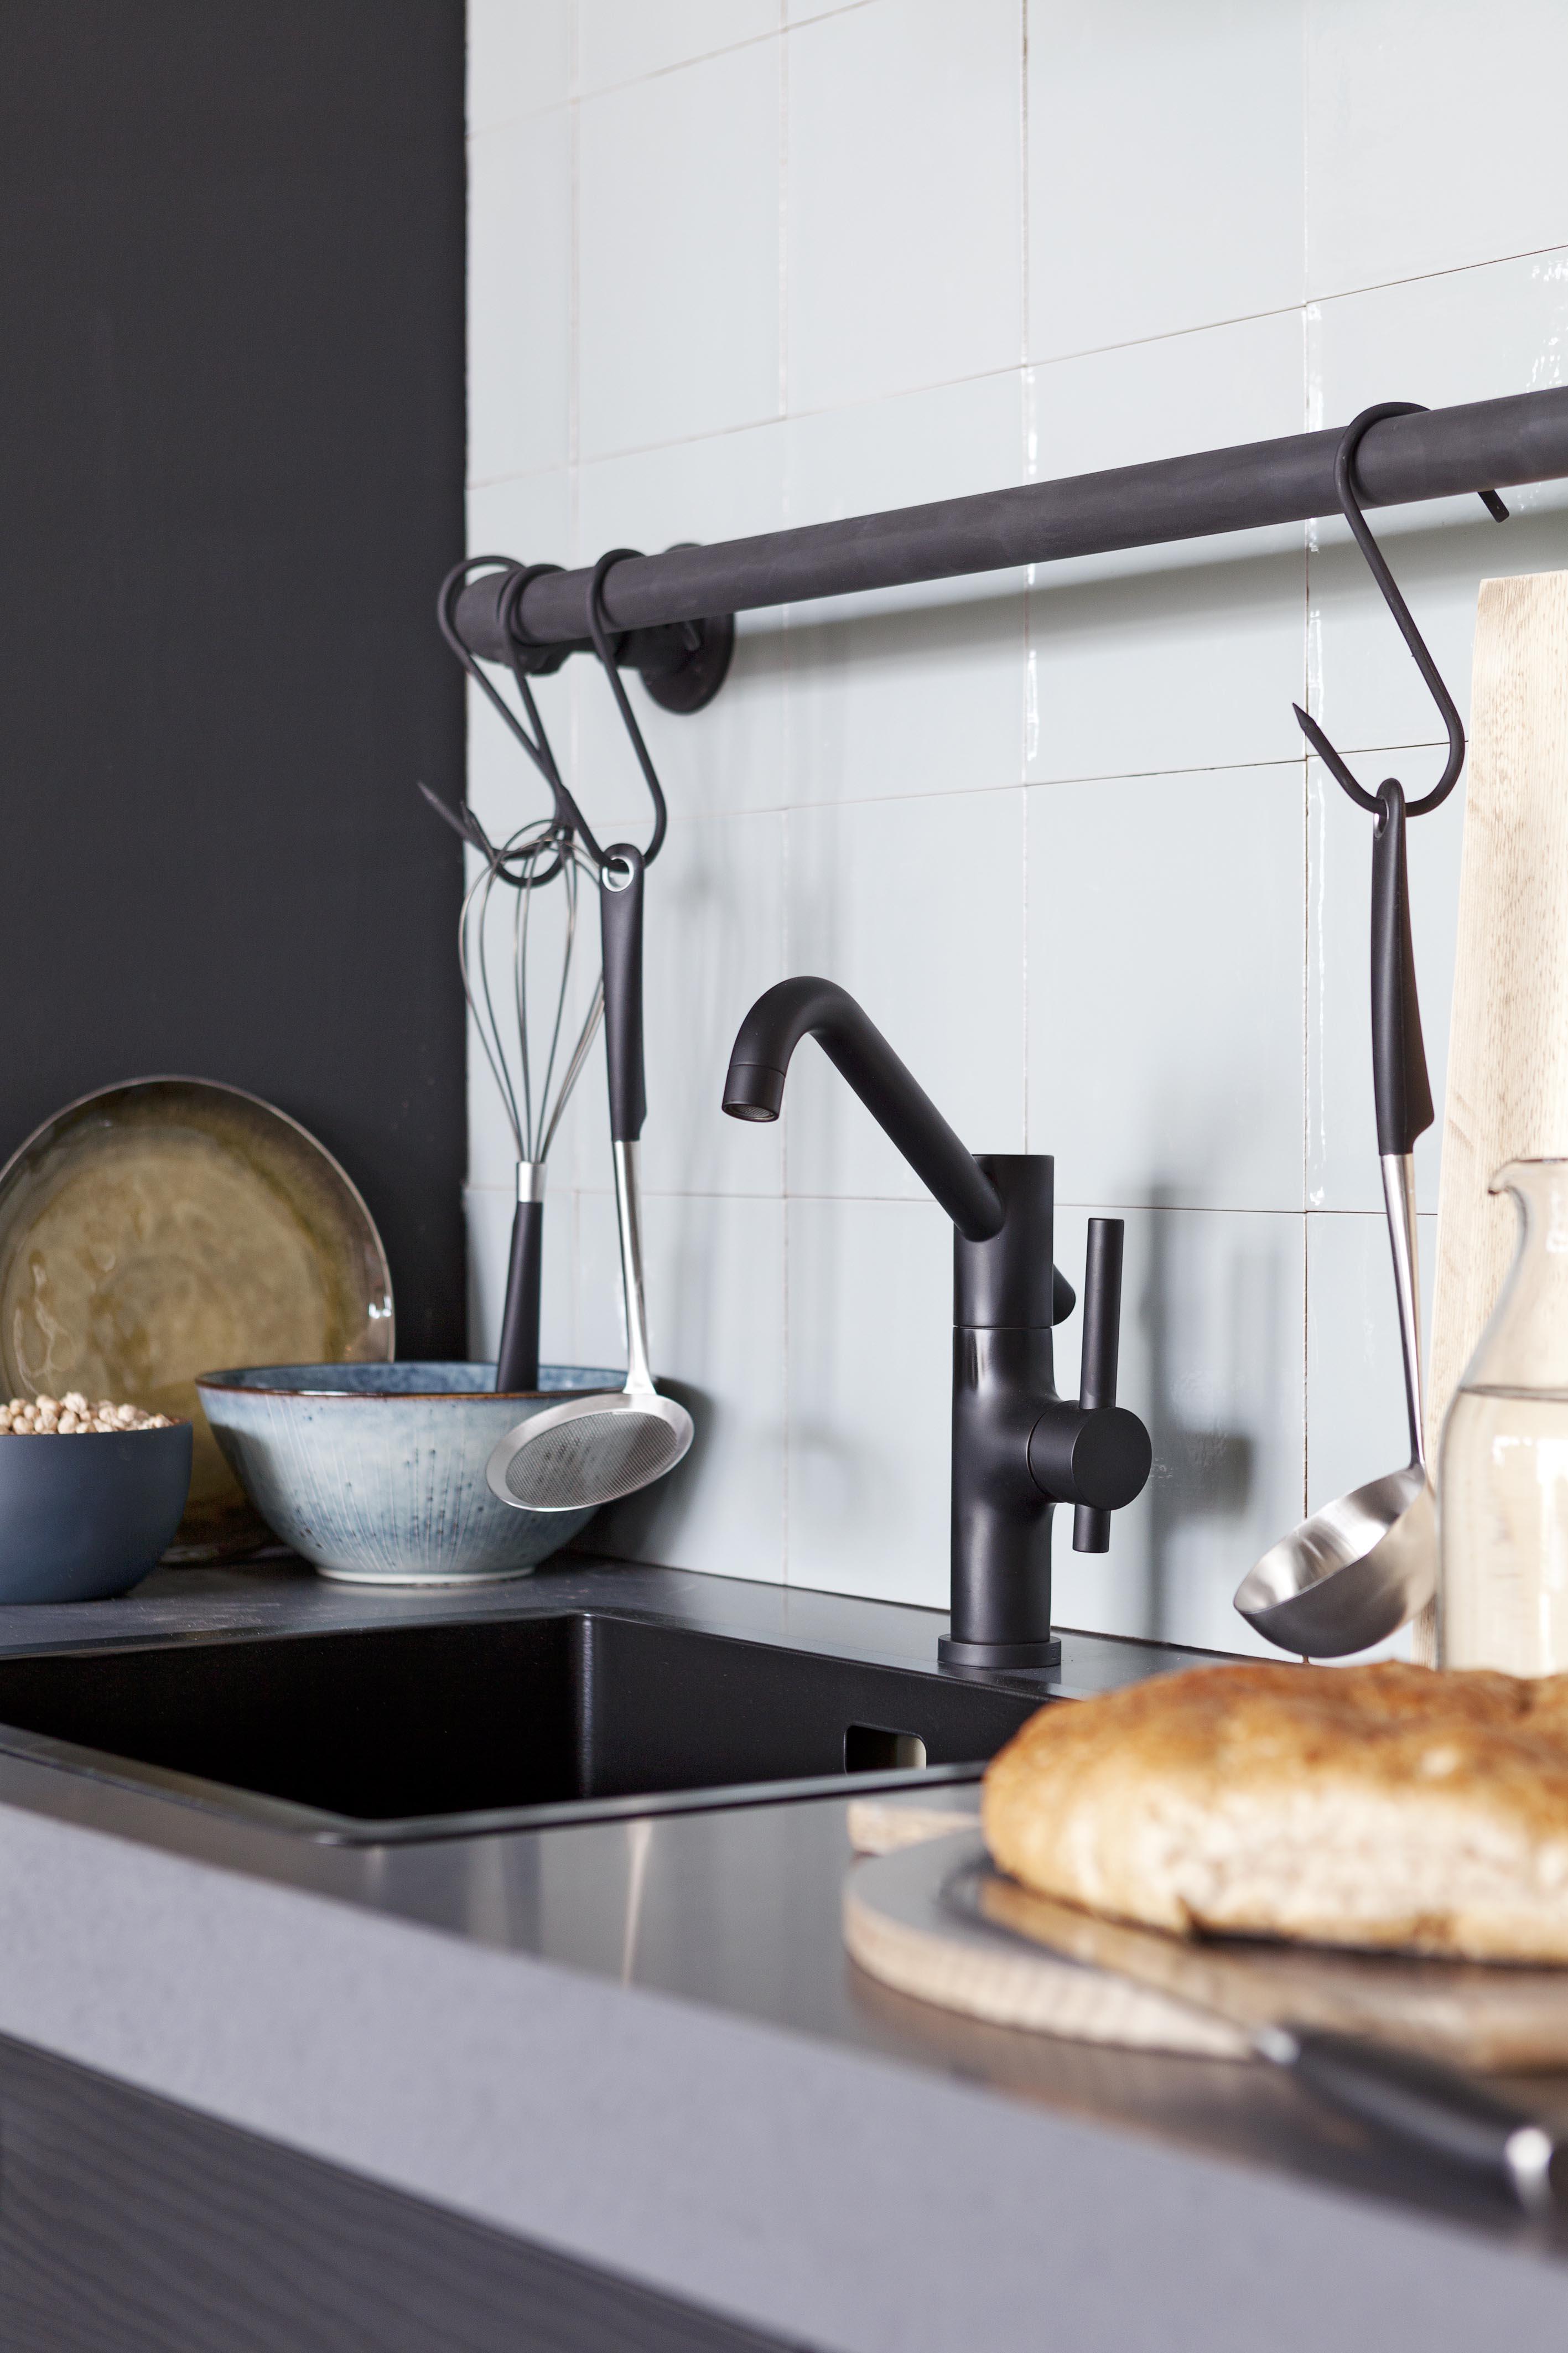 Vtwonen Keuken Tegels : Lucino keuken – Grando Keukens & Bad Zaandam